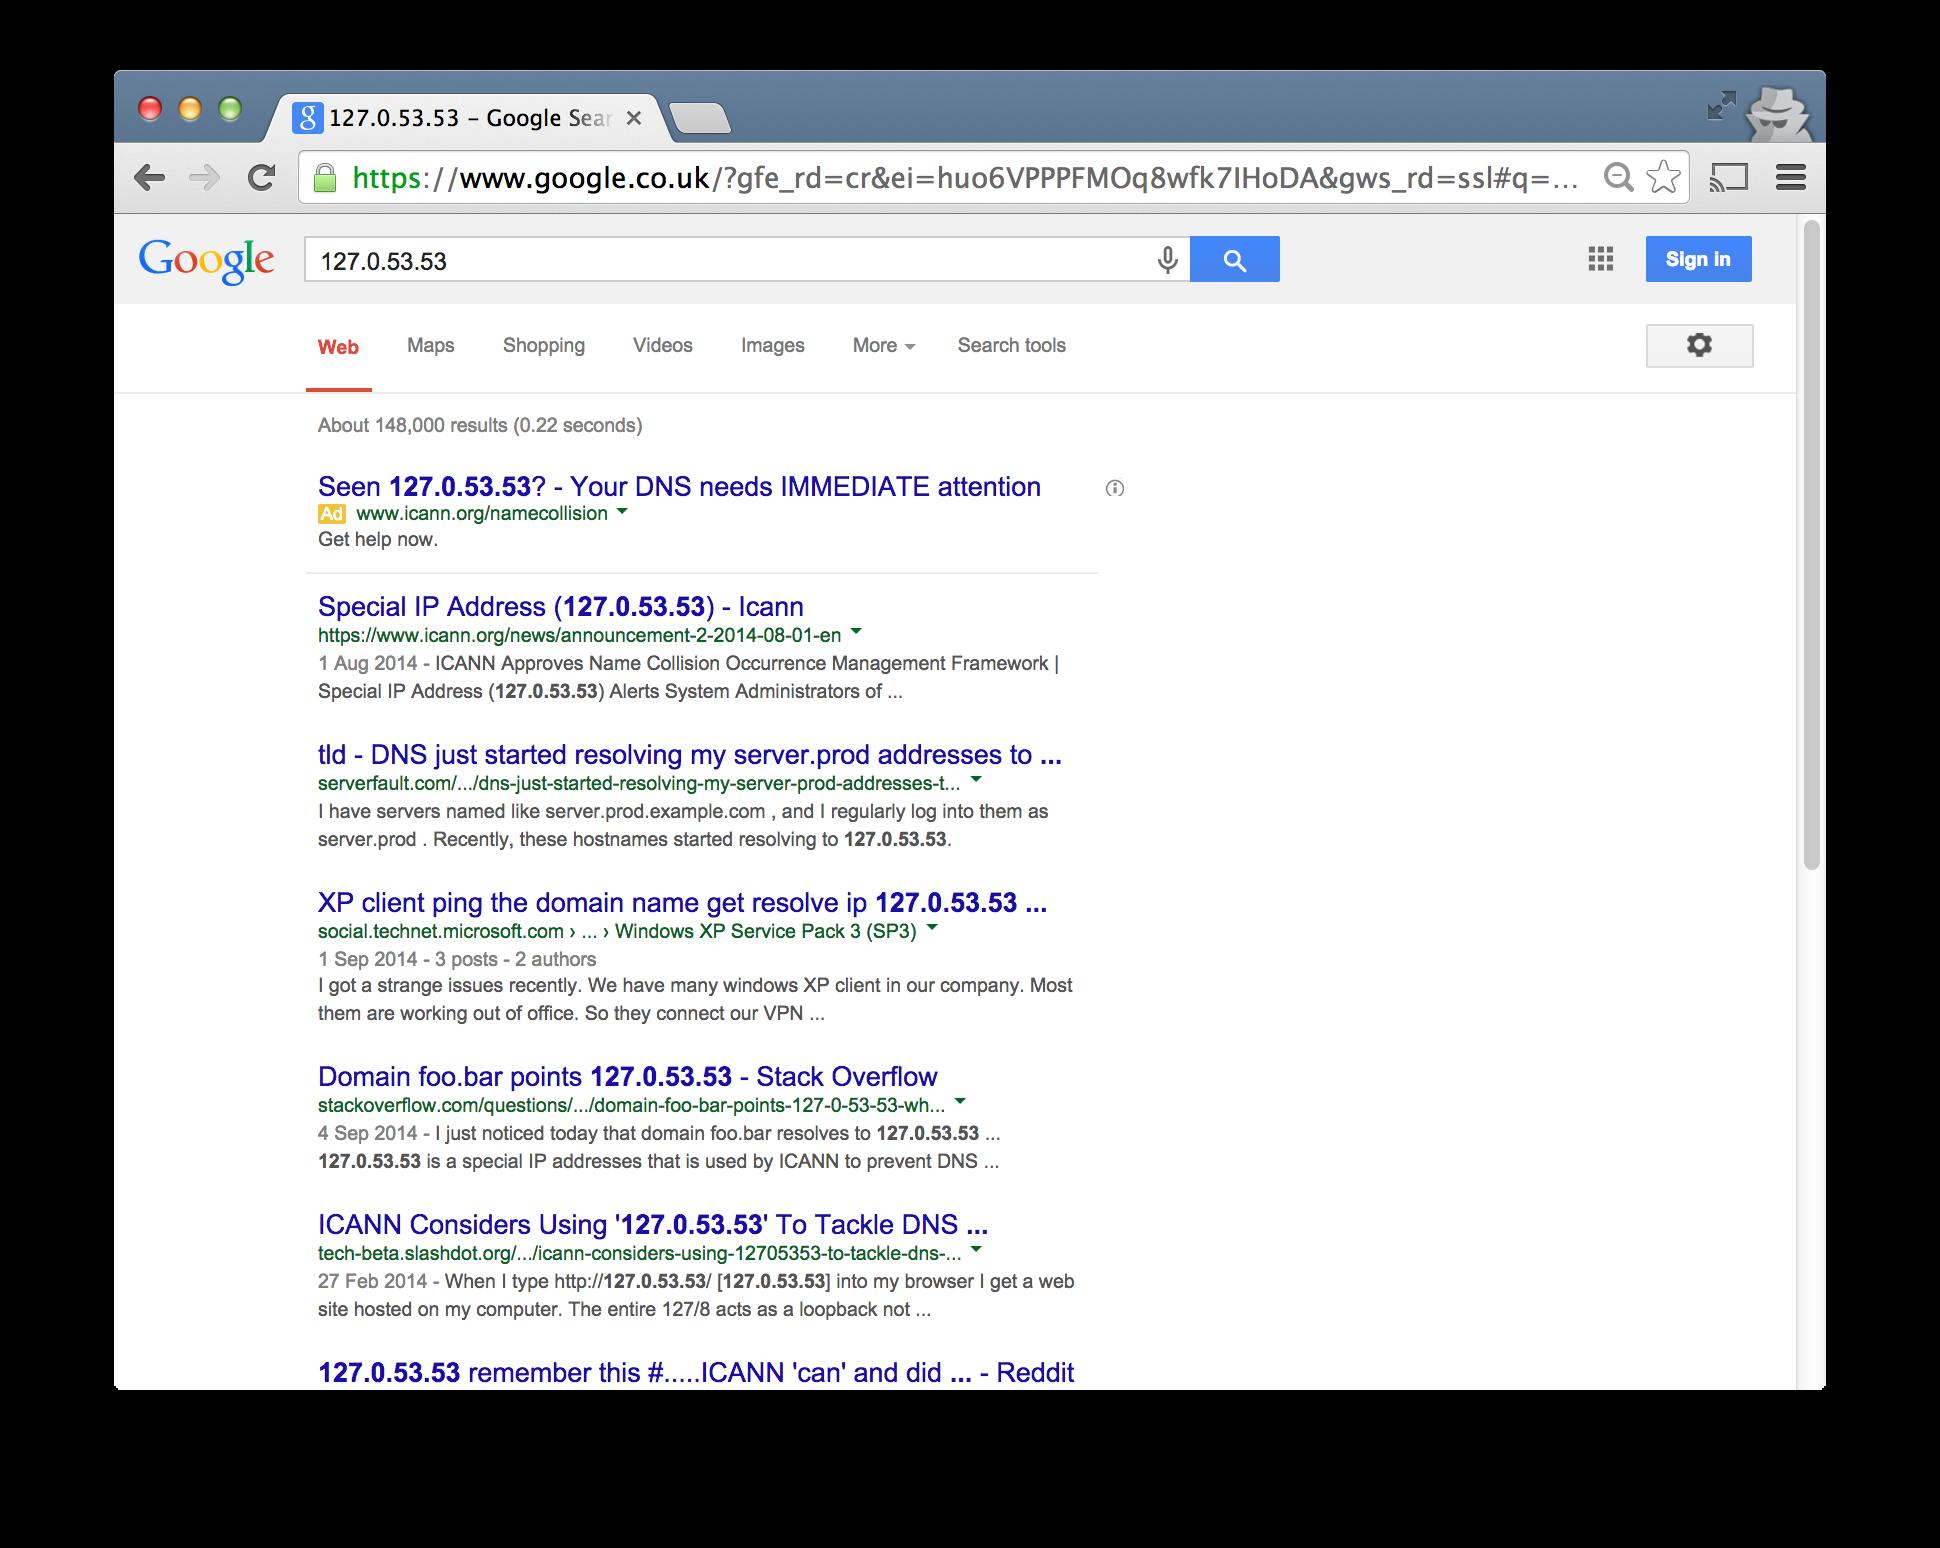 Google Search '127.0.53.53'